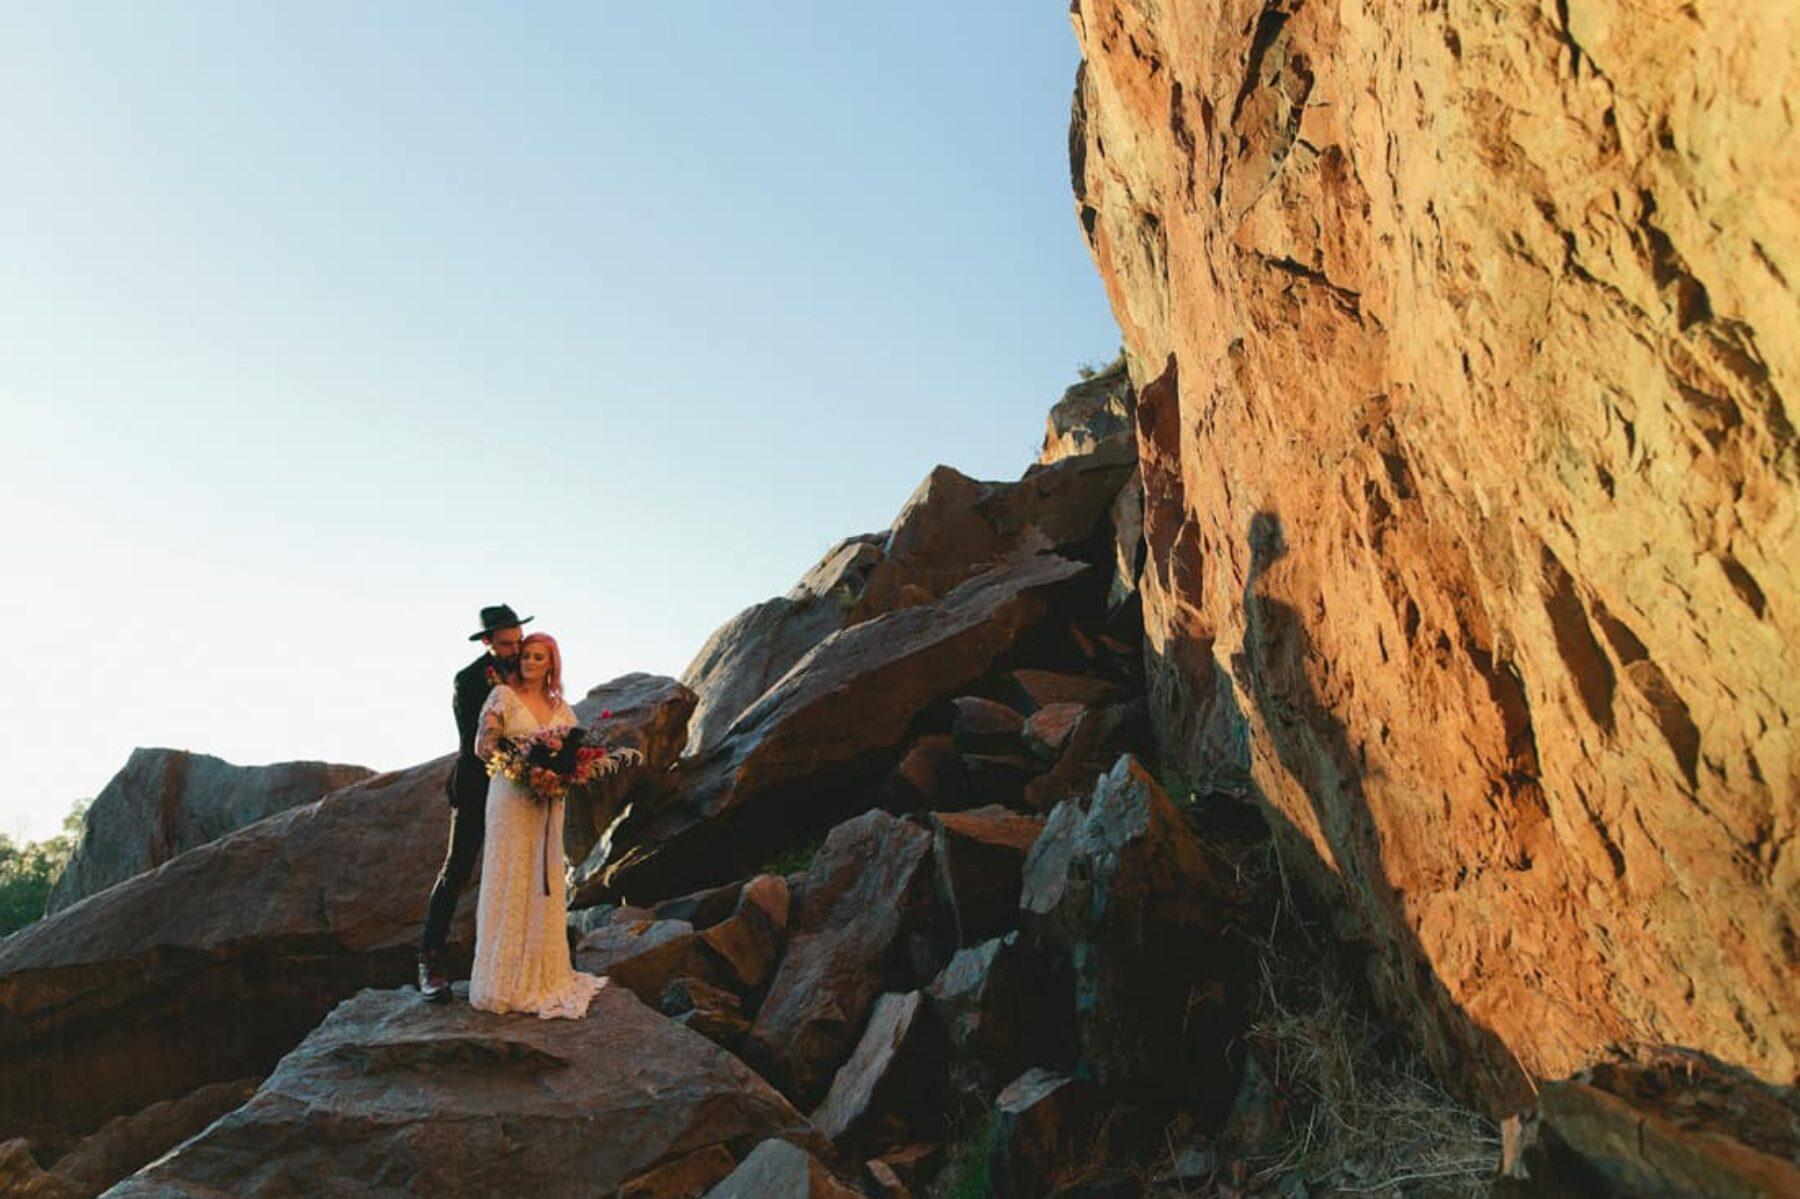 Rock n roll meets desert luxe - glamping wedding inspiration